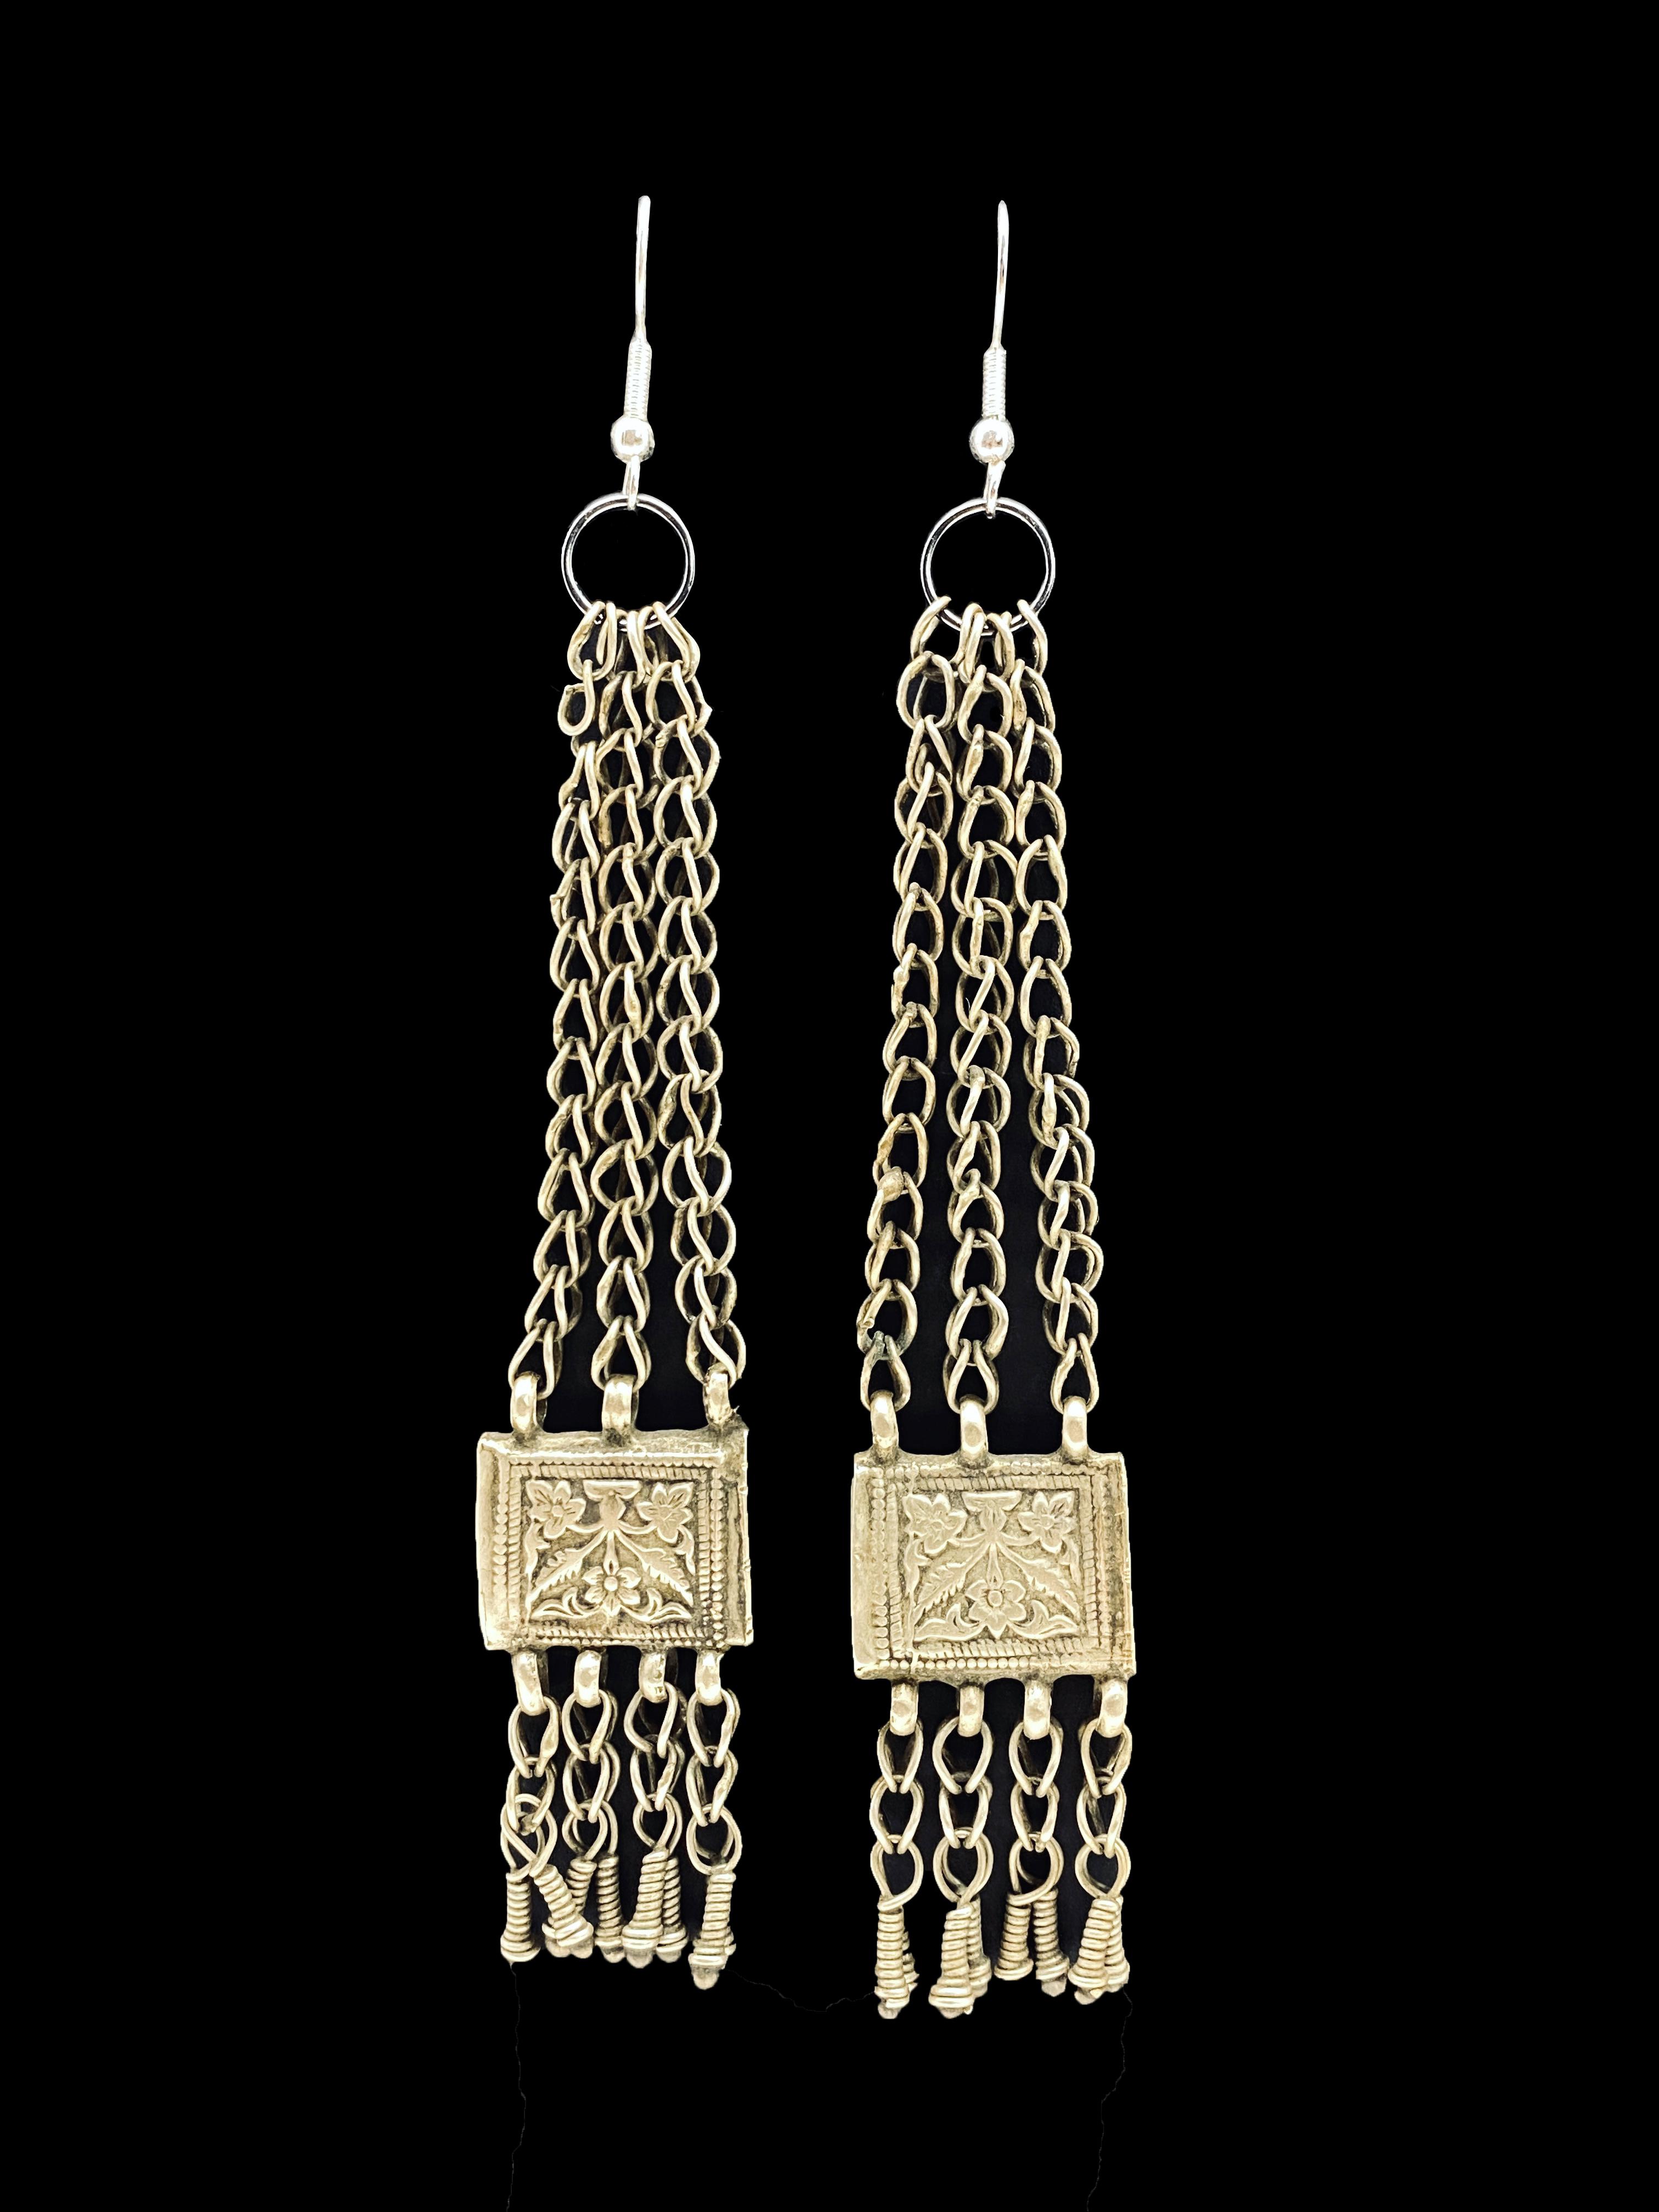 Vintage Prayer Box Earrings - India (A)